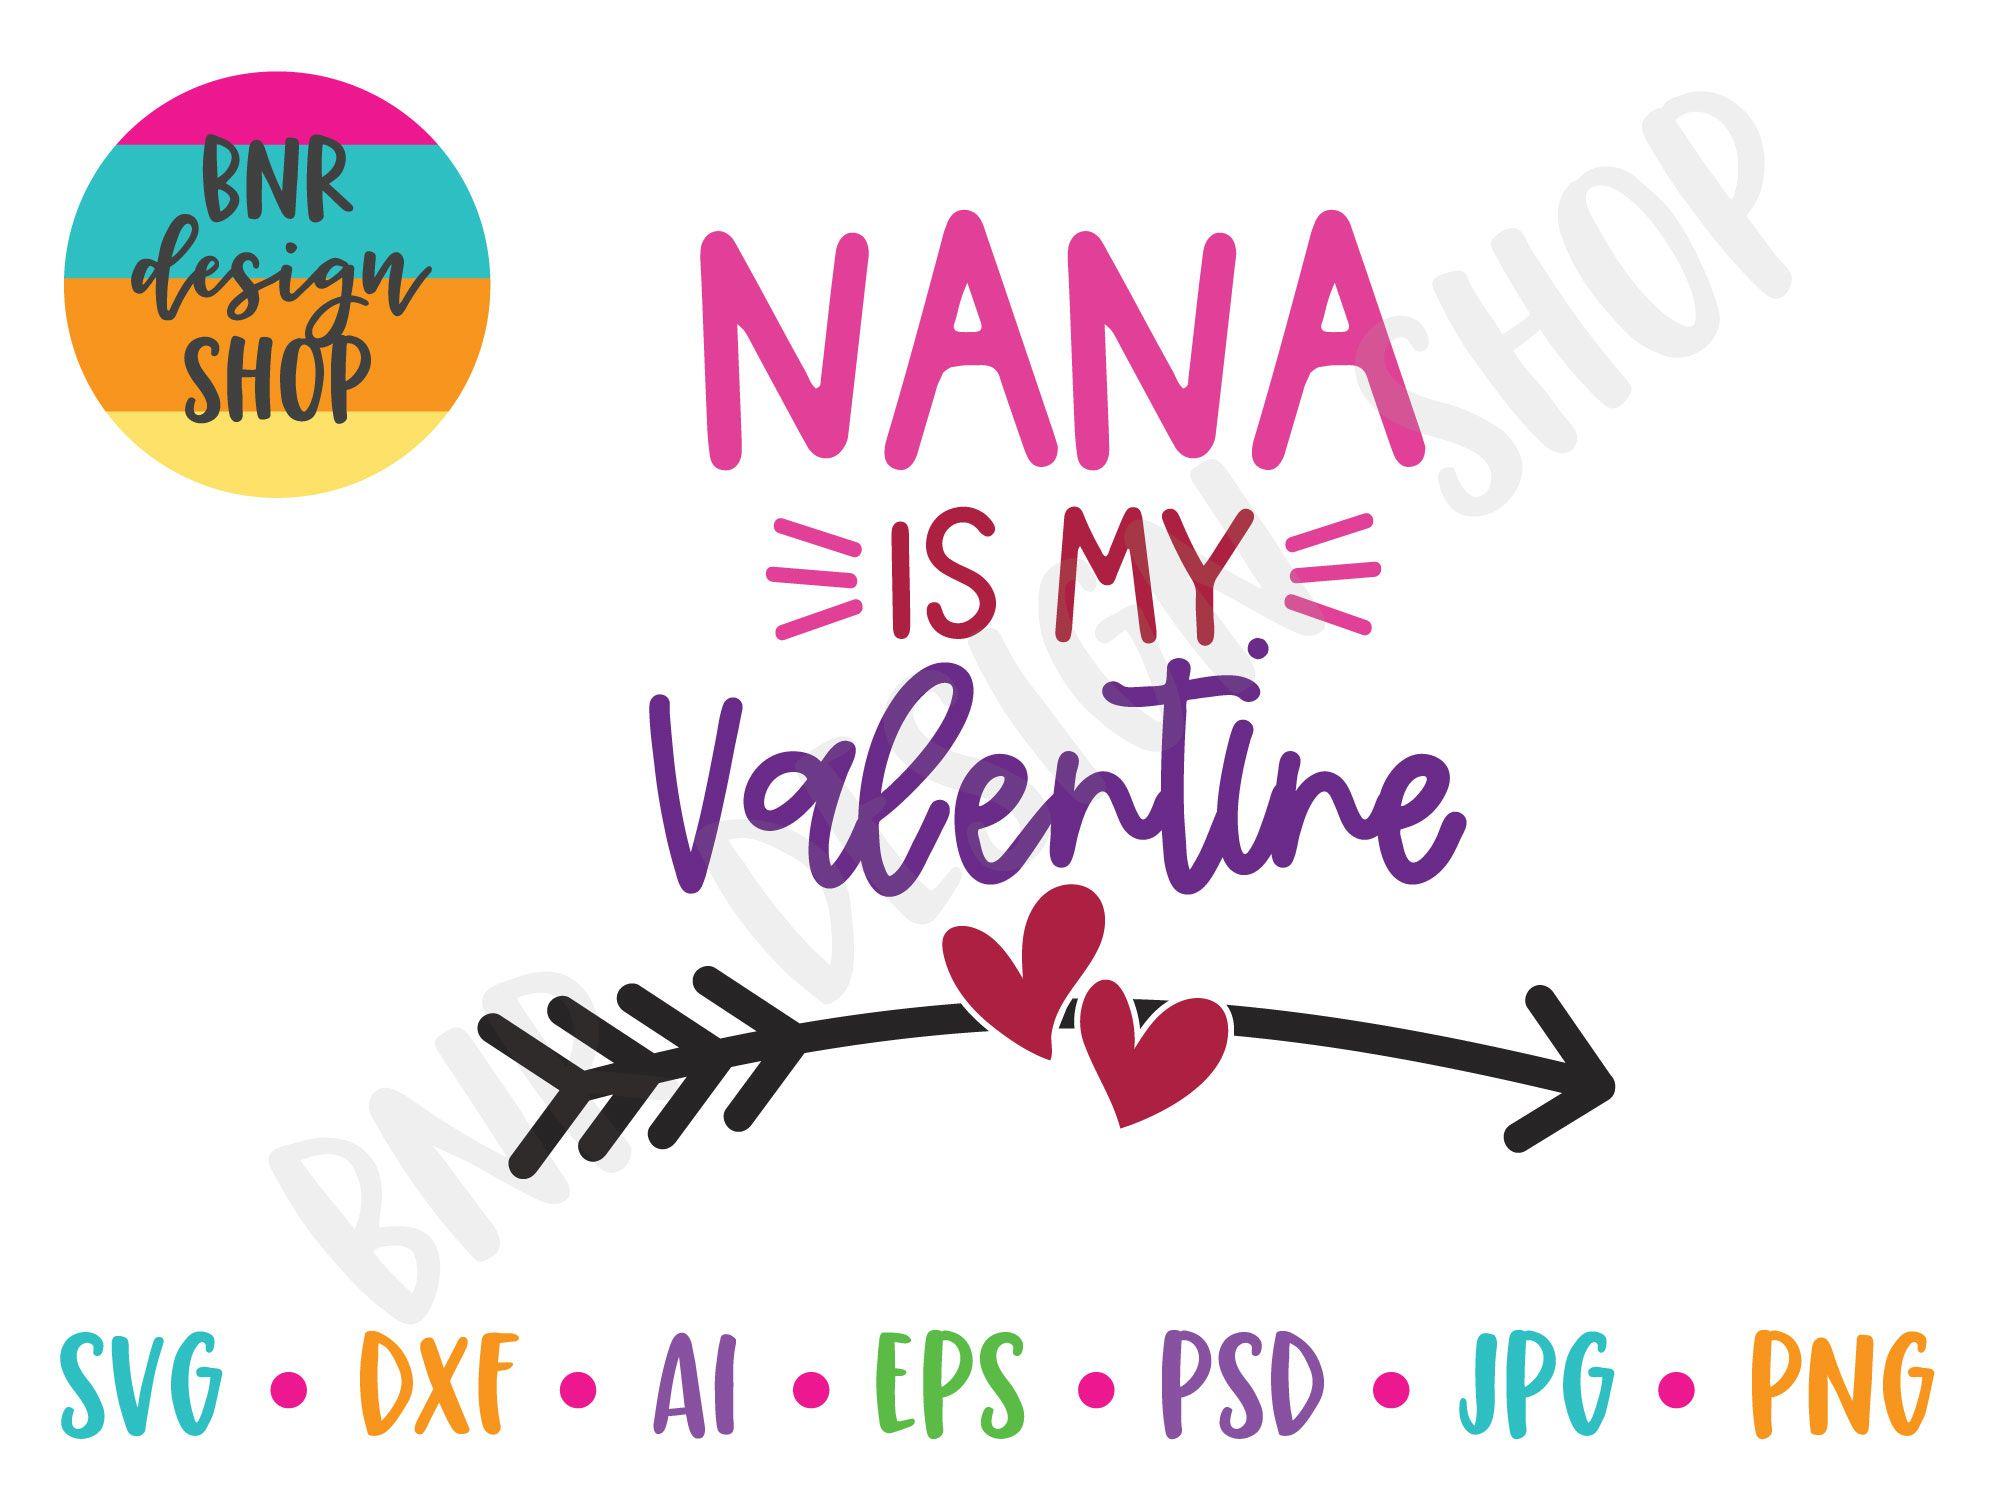 Nana Is My Valentine SVG Be my valentine, Cricut design